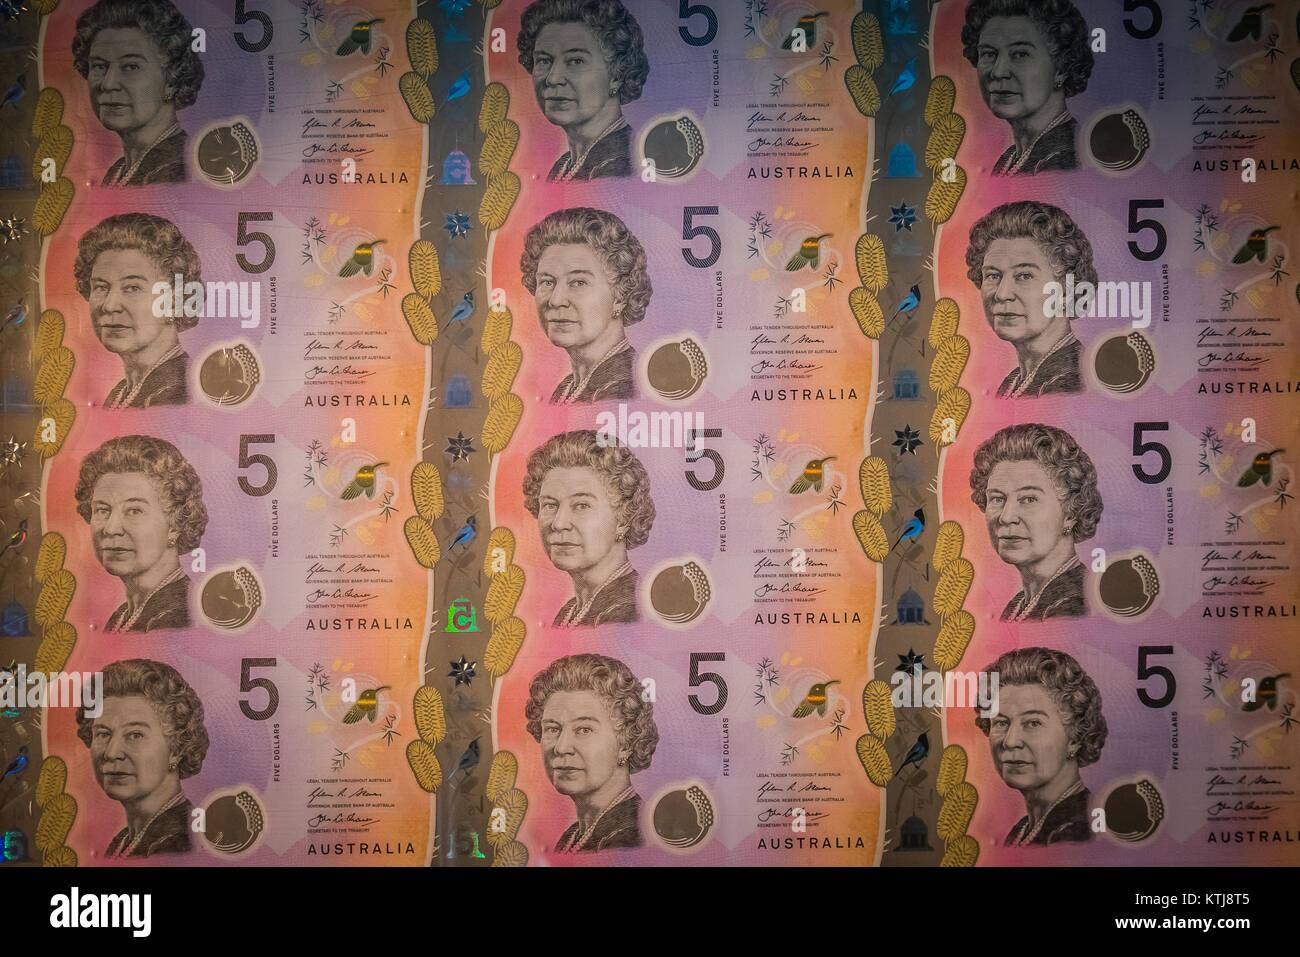 uncut australian bank notes - Stock Image